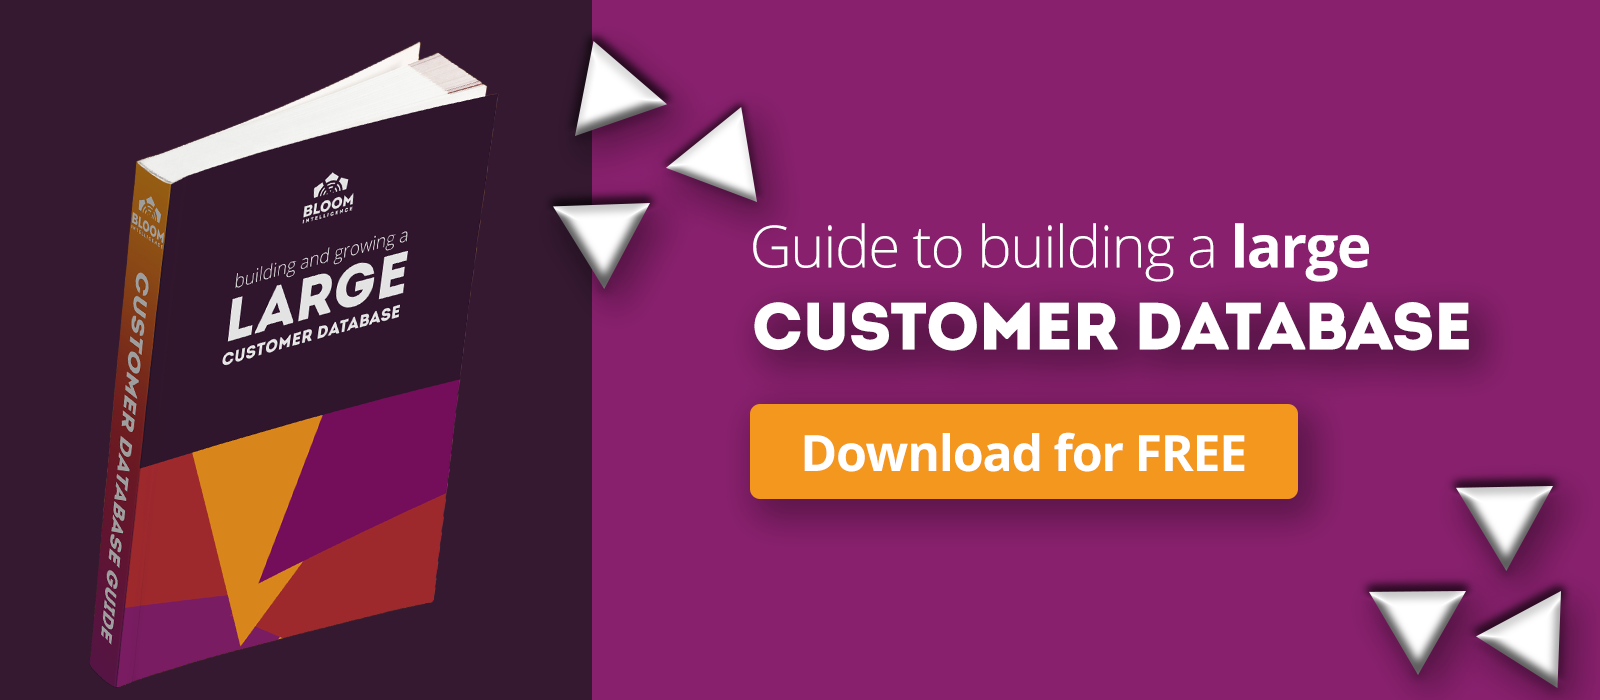 Bloom Intelligence Customer Experience Platform